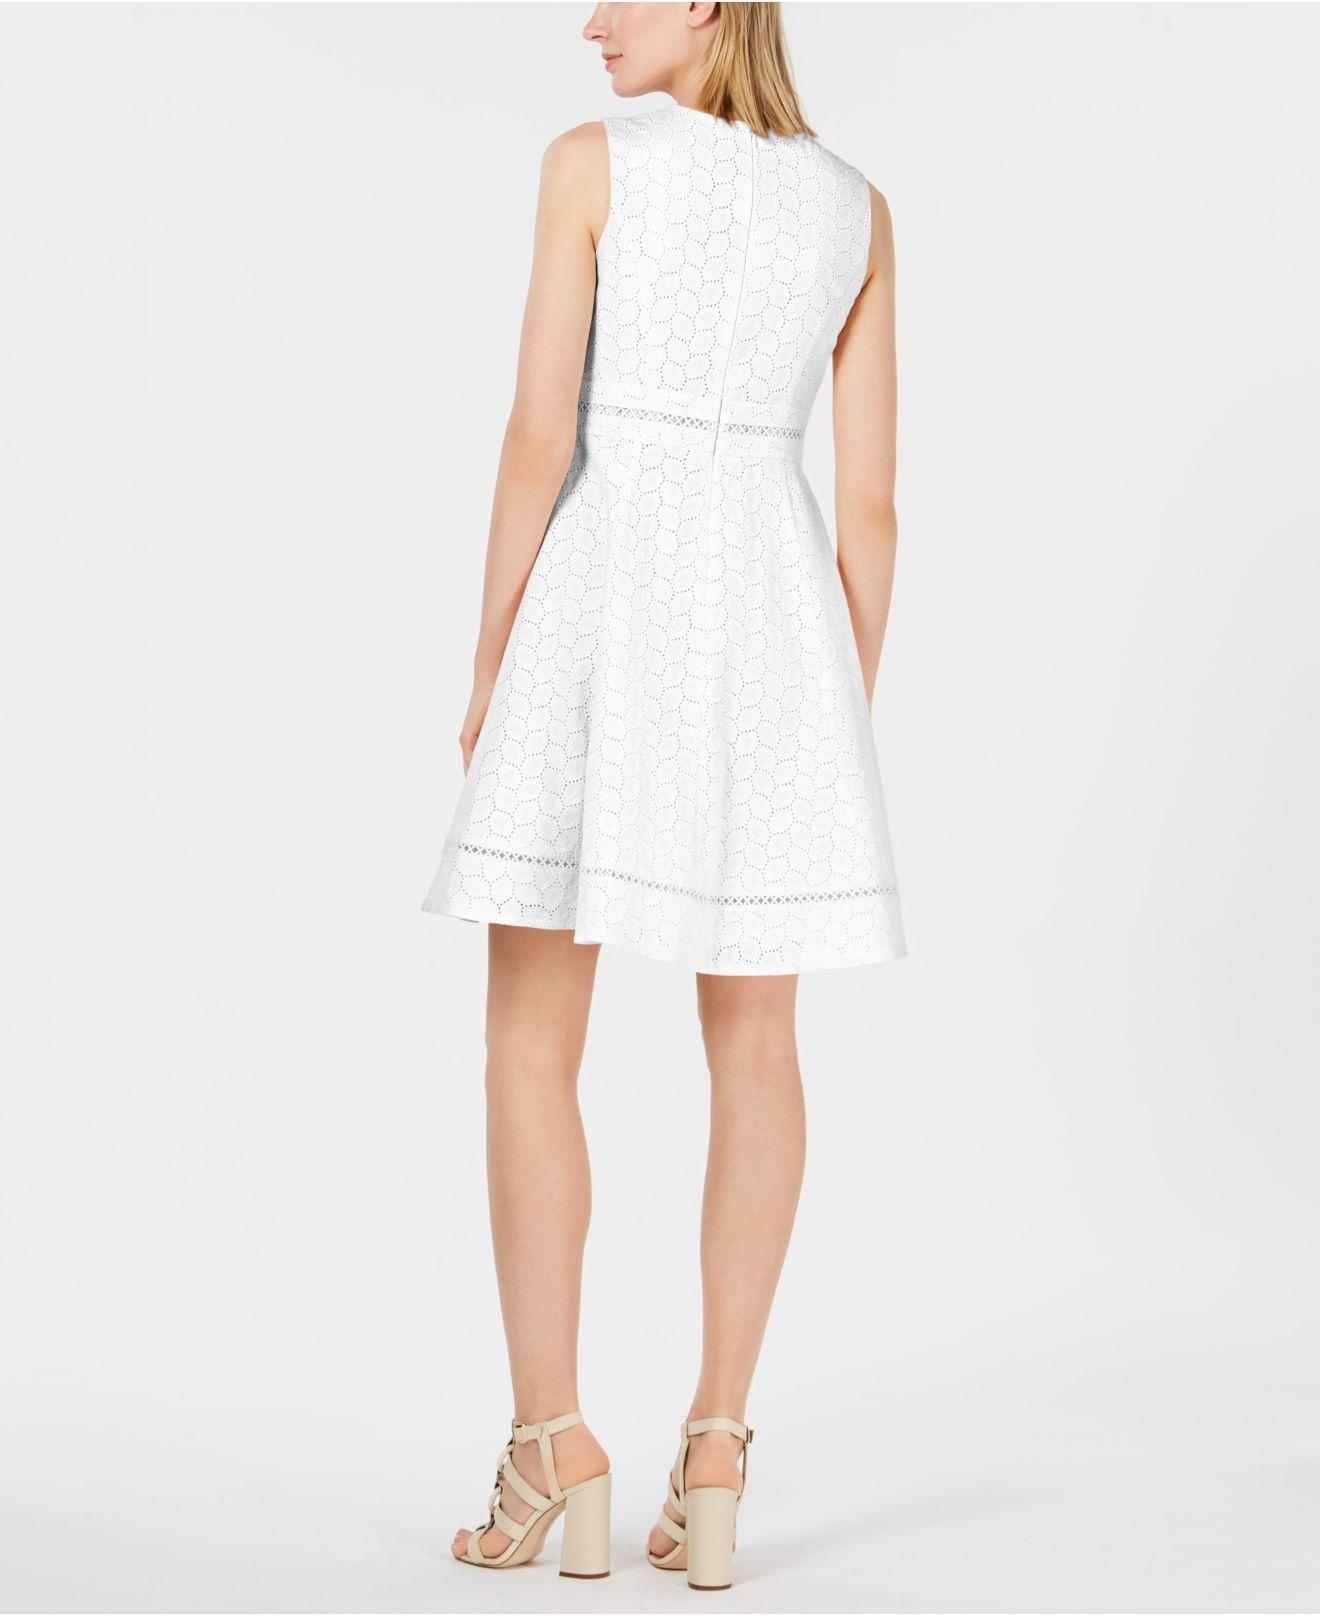 a6302933b1a Calvin Klein - White Eyelet Fit   Flare Dress - Lyst. View fullscreen